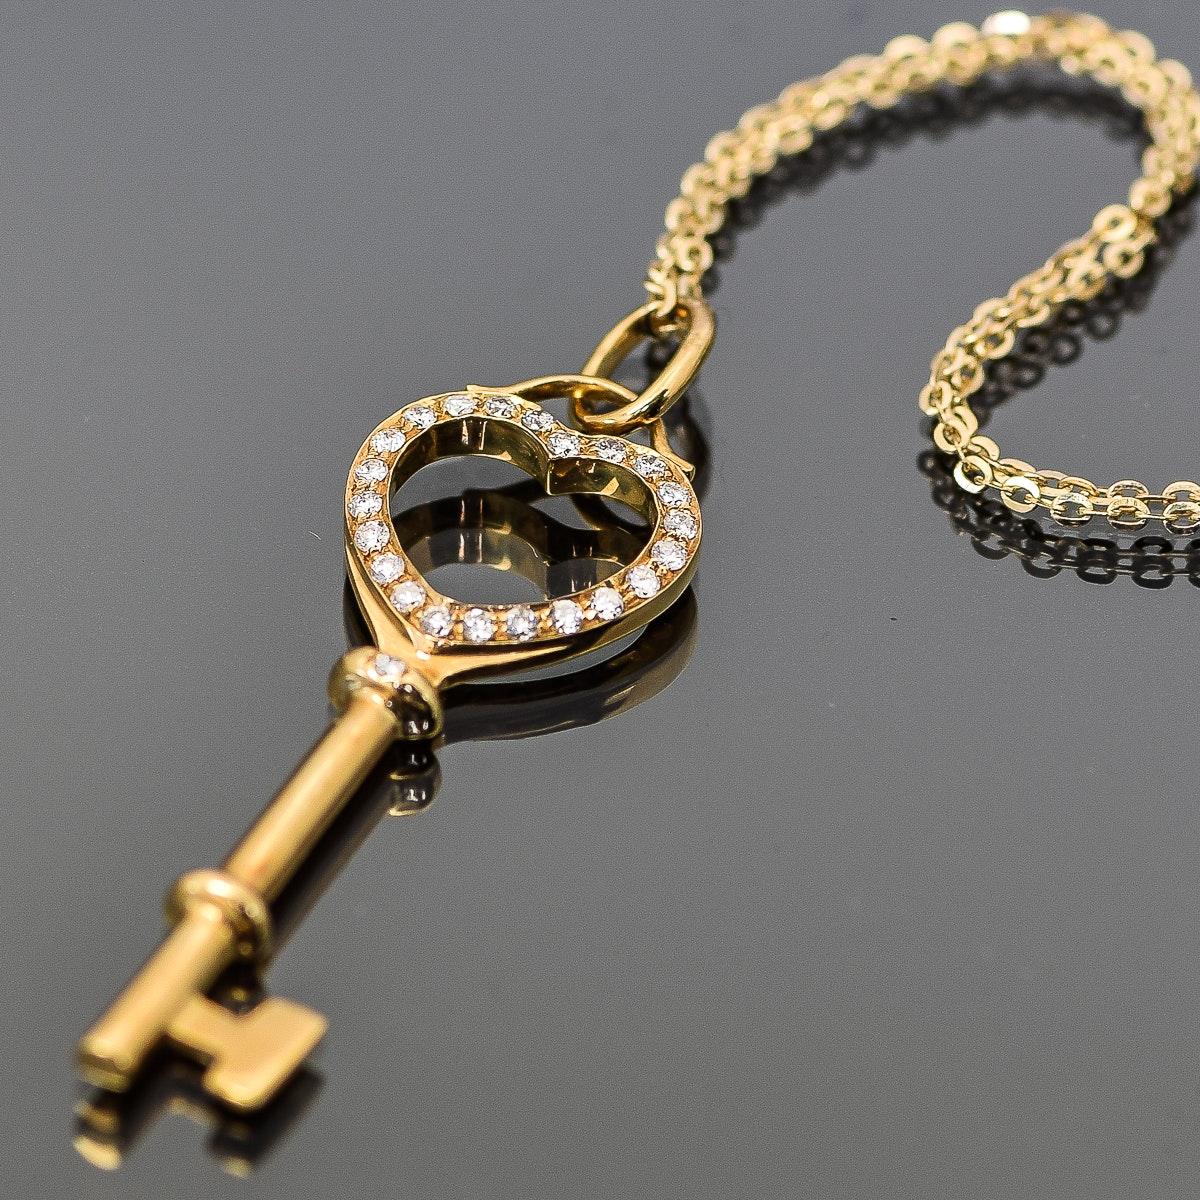 18K Yellow Gold and Diamond Turn Key Pendant Necklace